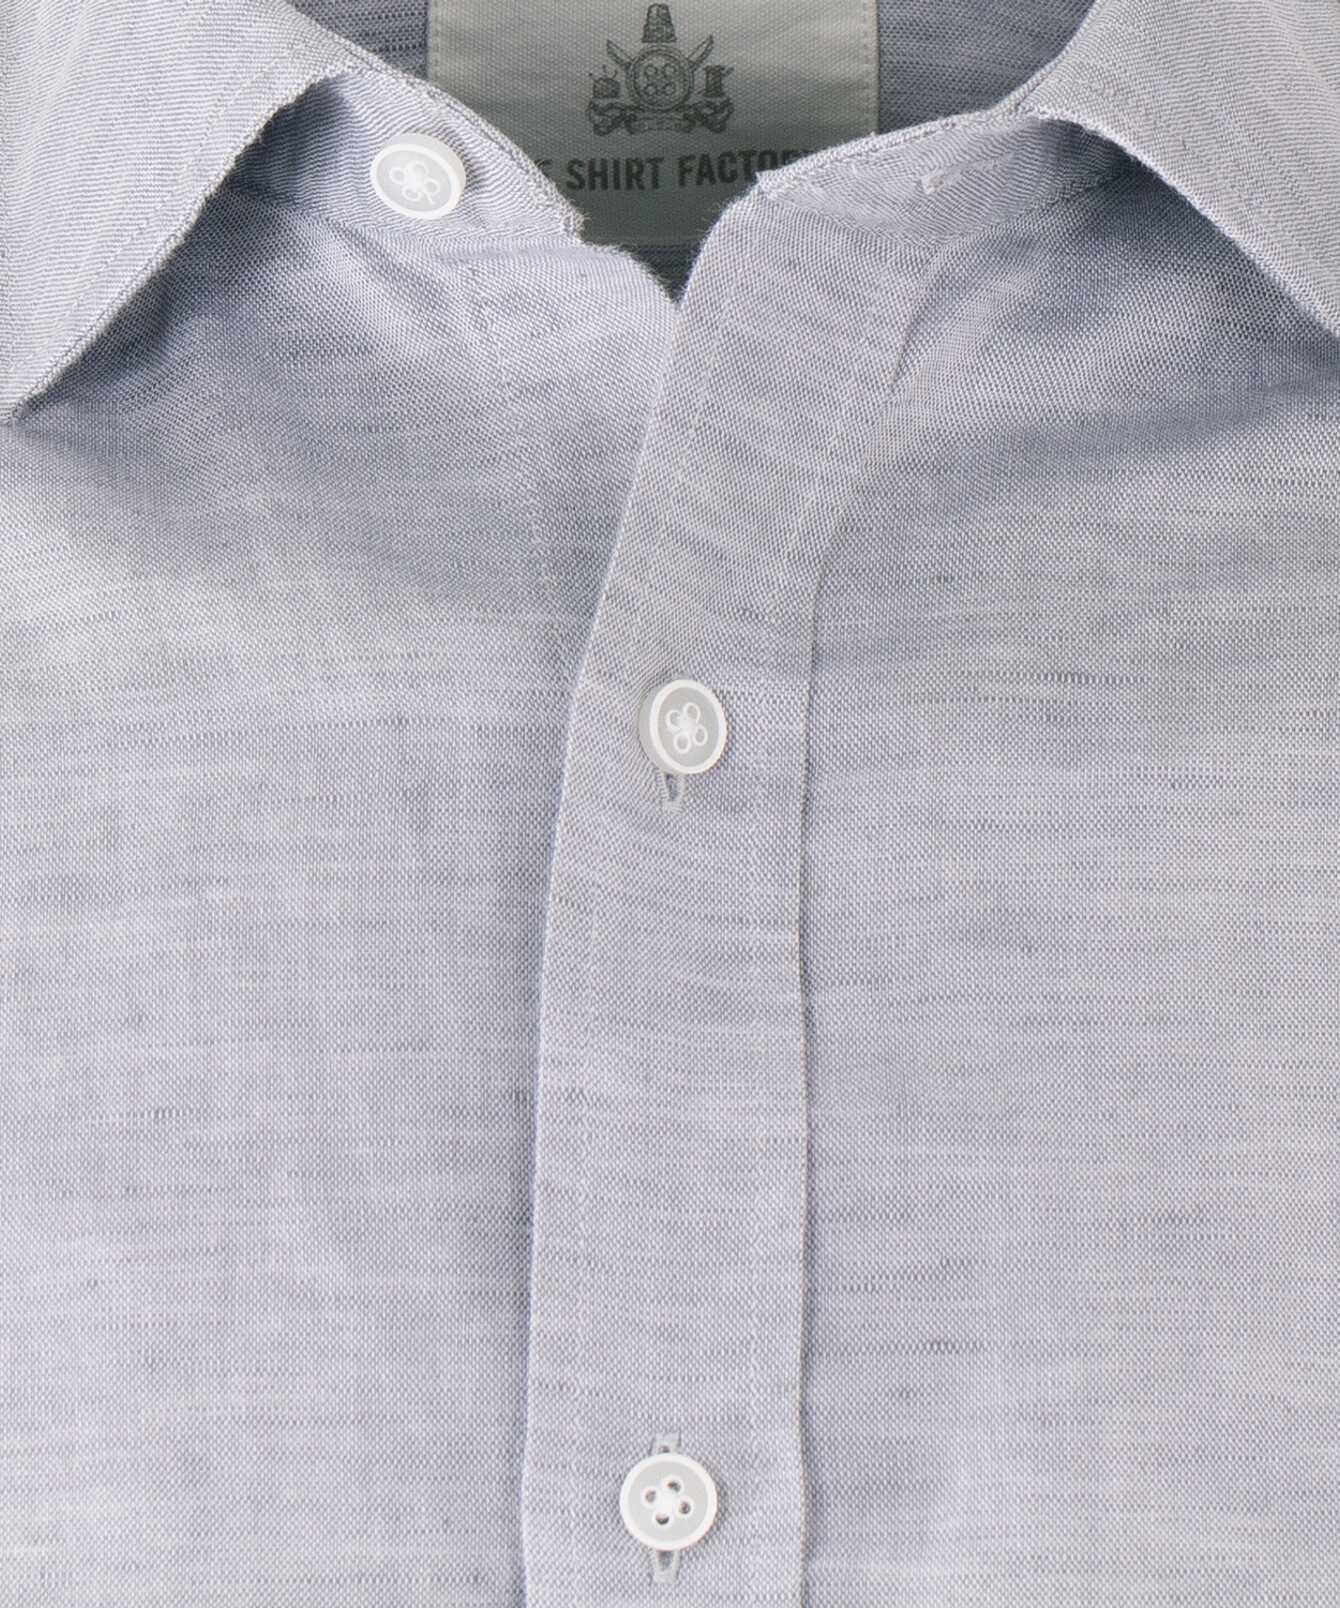 Skjorta Portofino Linne Grå  The Shirt Factory